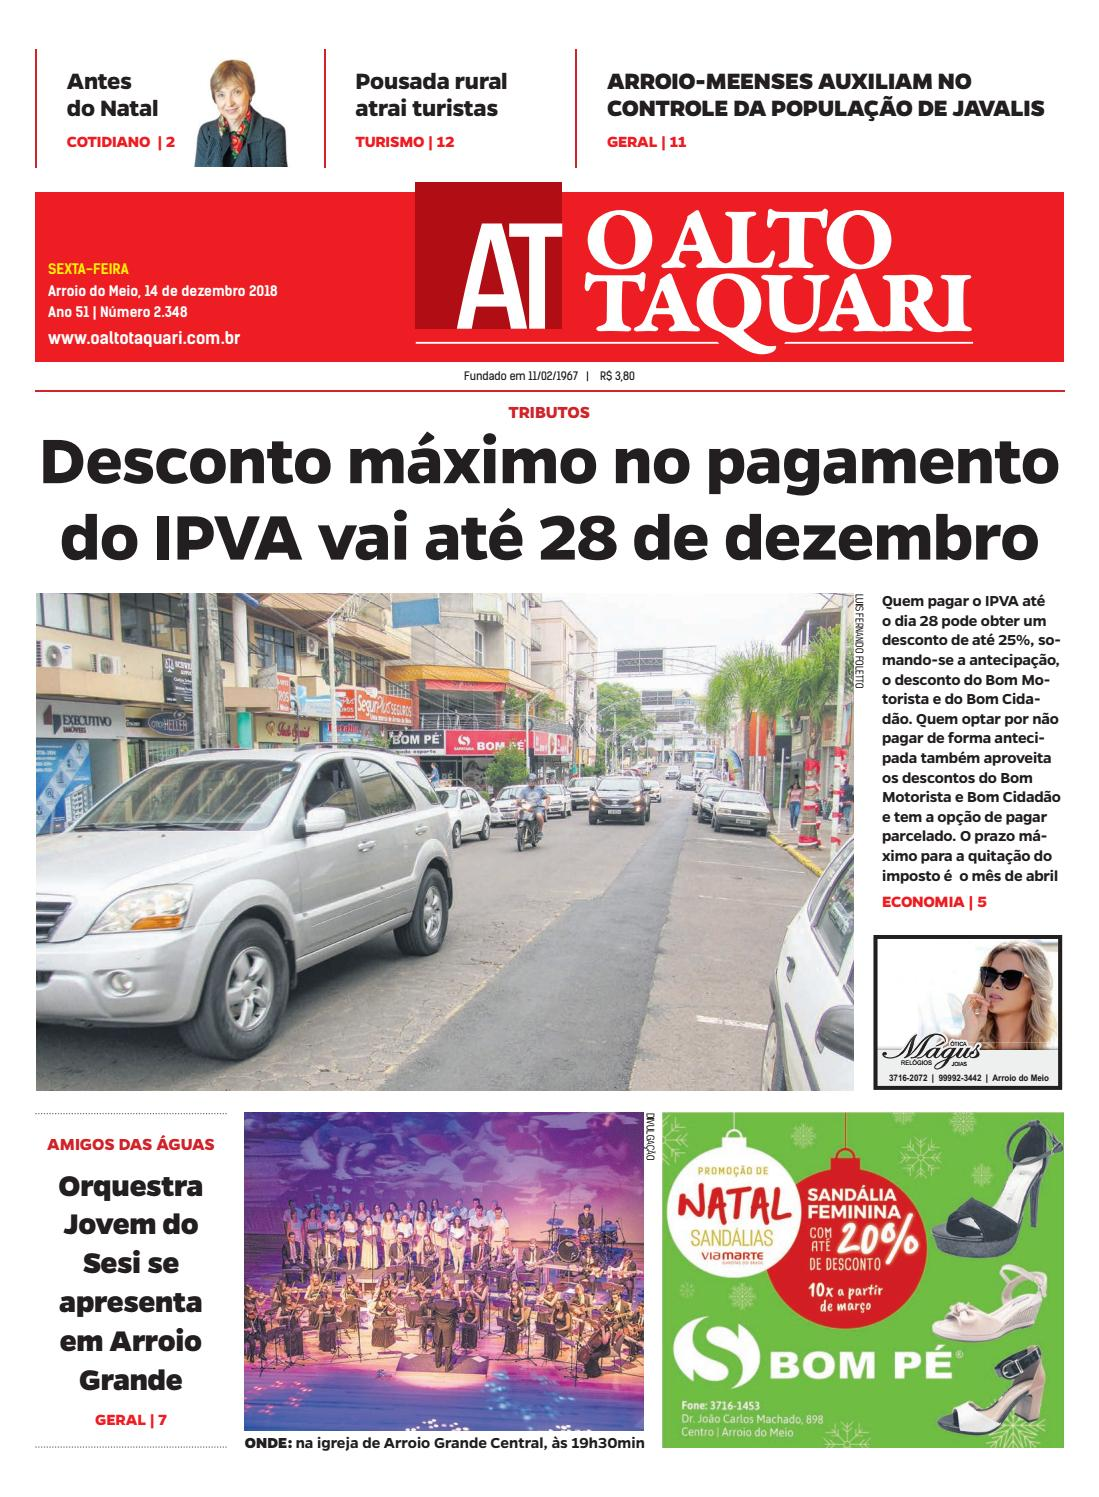 Jornal O Alto Taquari - 14 de dezembro de 2018 by Jornal O Alto Taquari -  issuu 1f595c55da